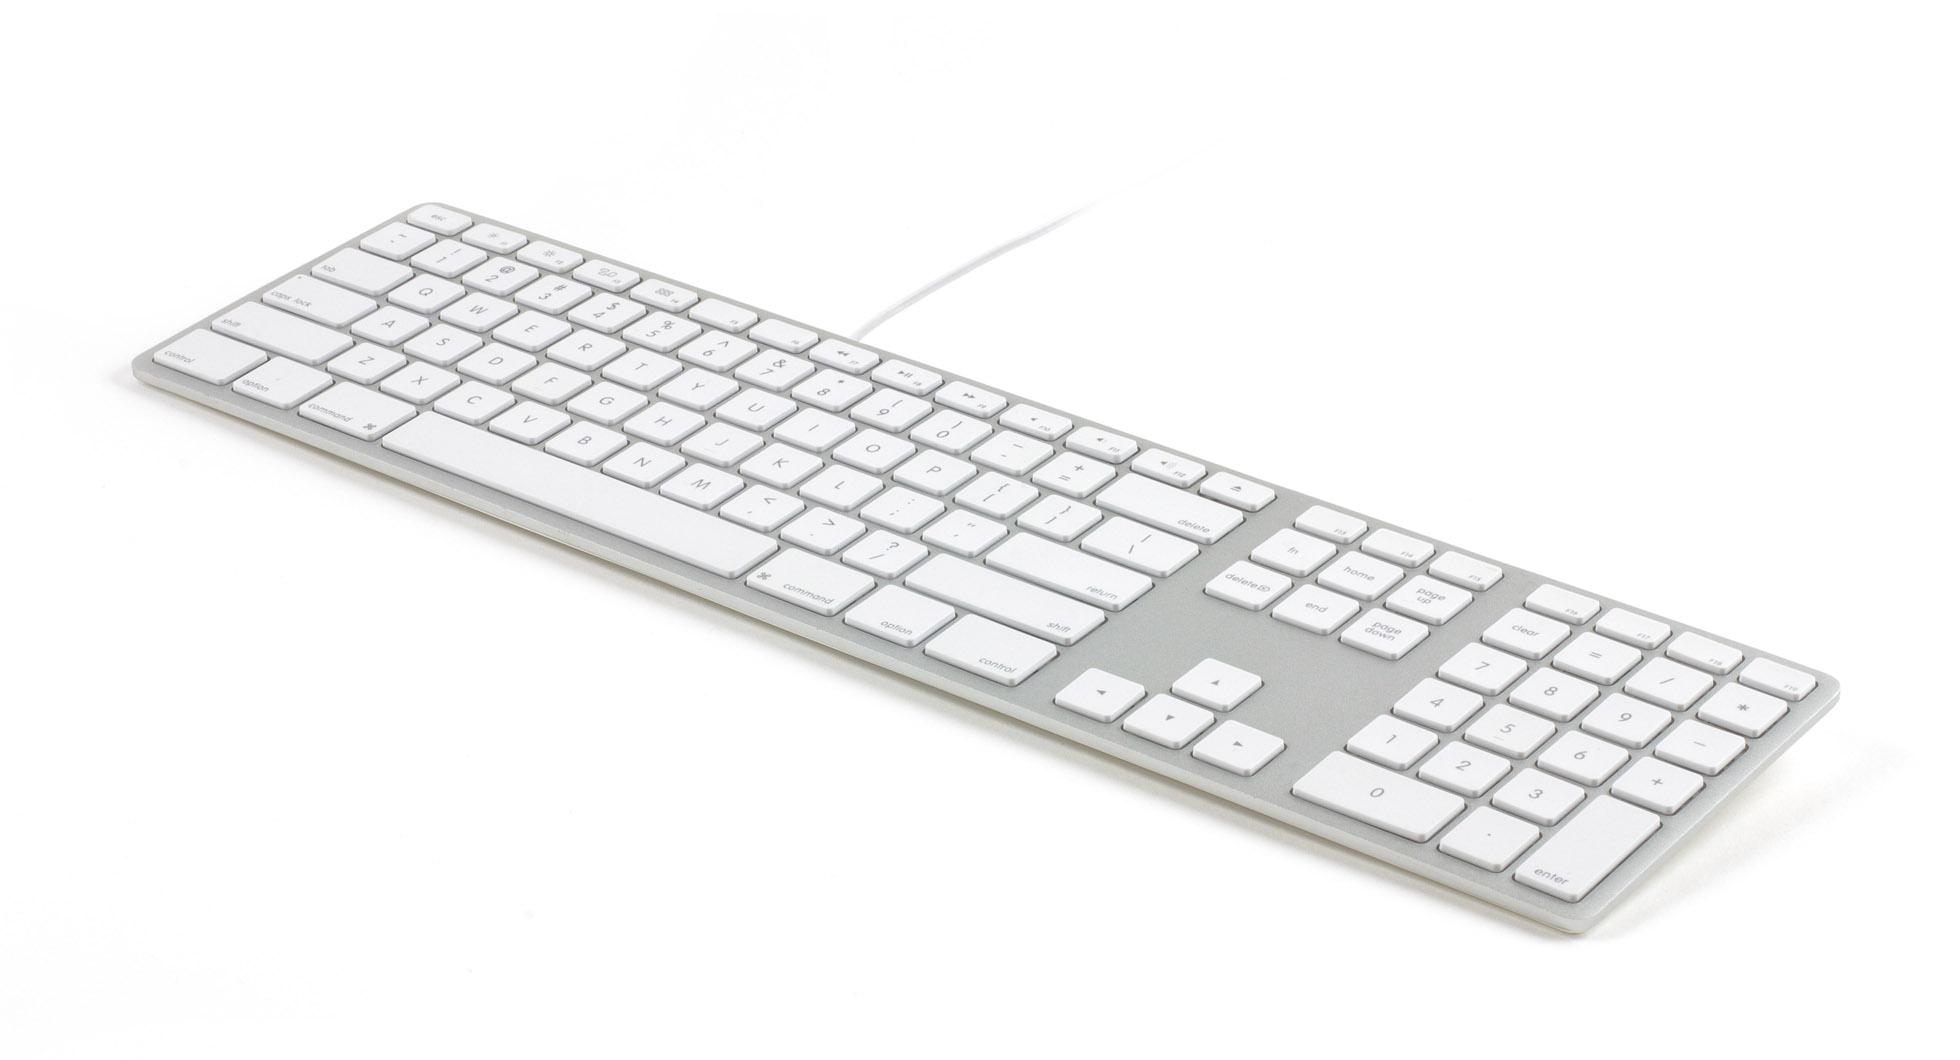 Matias Announces Rgb Backlit Version Of Wired Aluminum